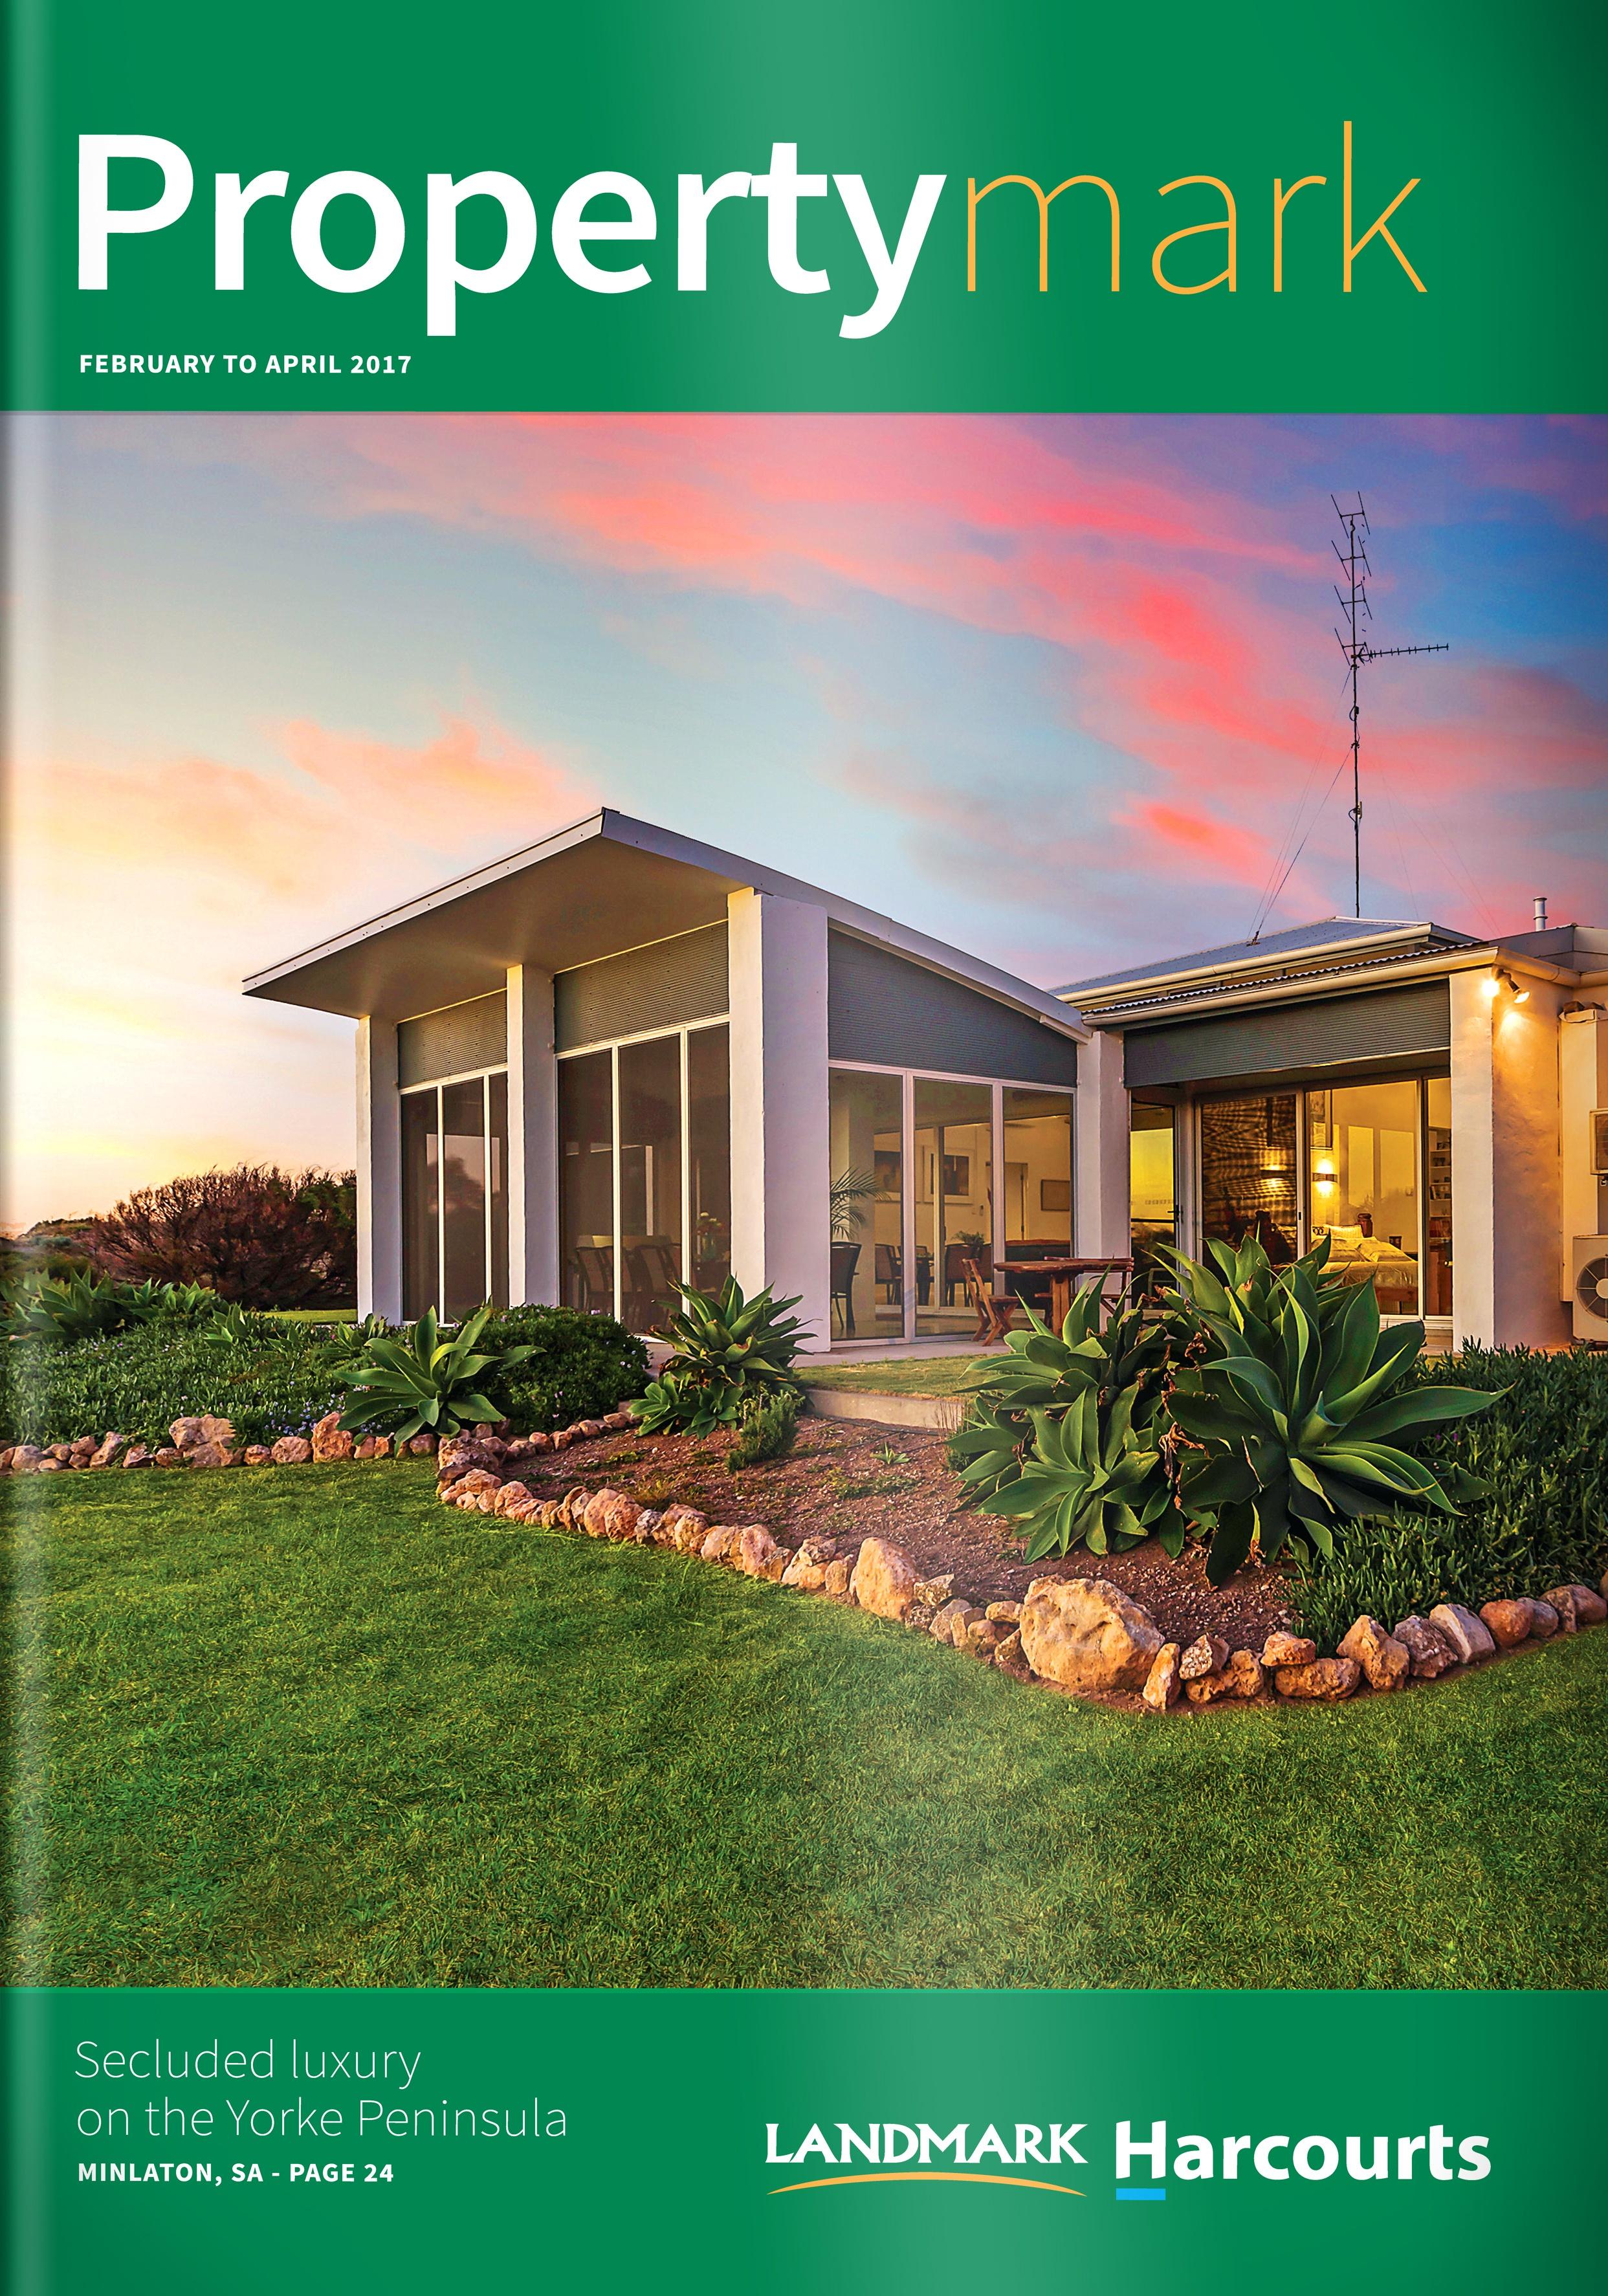 Propertymark Feb 17 - realistic cover.jpg